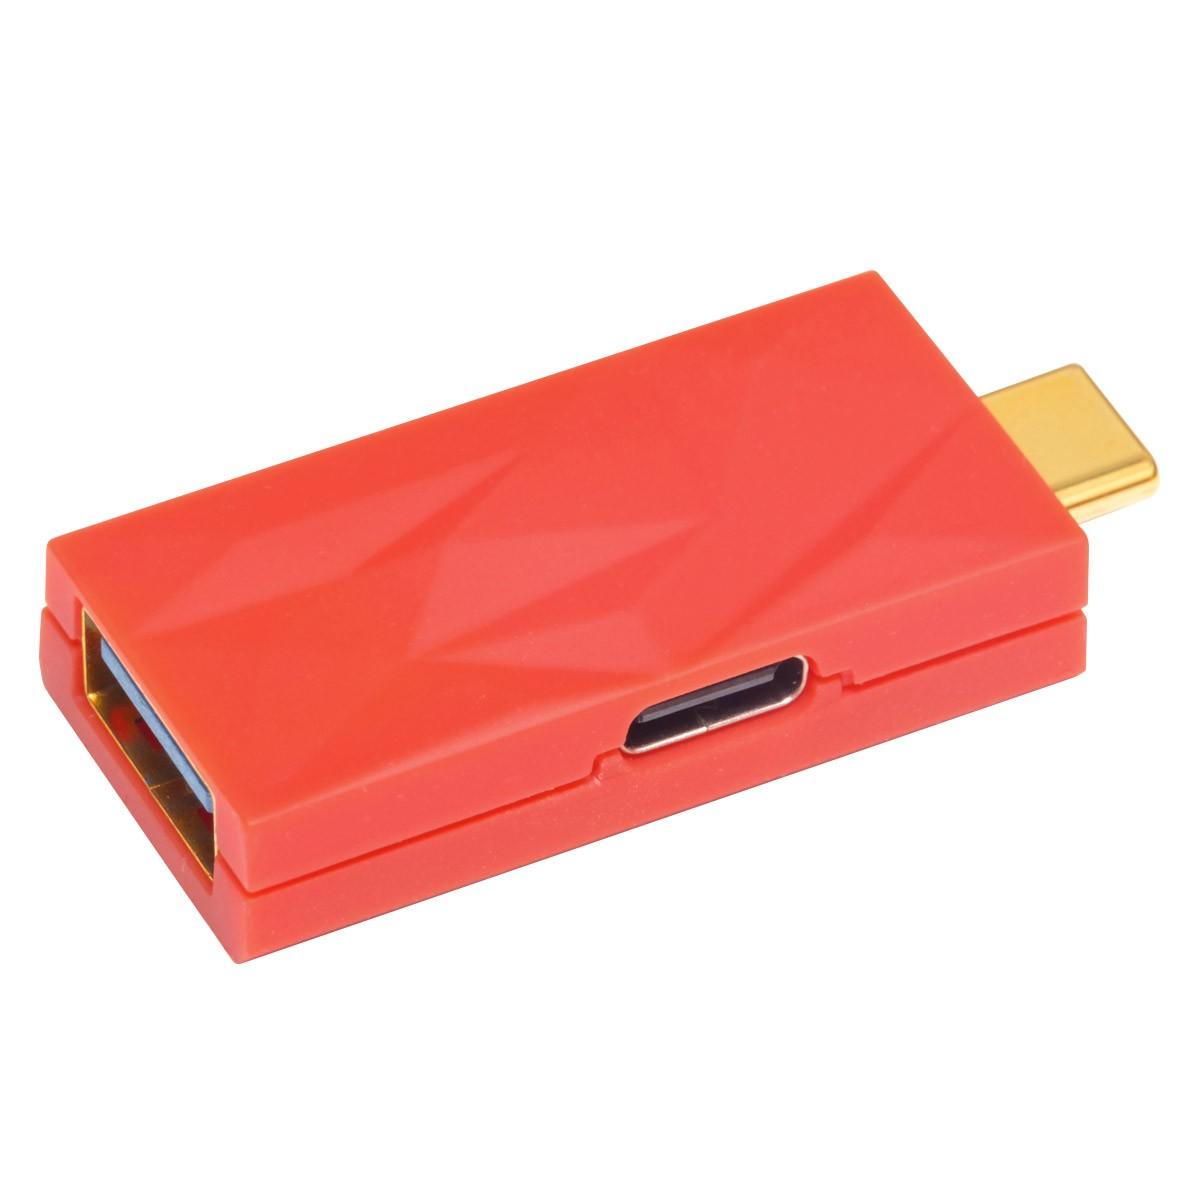 IFI AUDIO IDEFENDER+ Filtre Anti Boucle de Masse USB-C Mâle vers USB-A Femelle